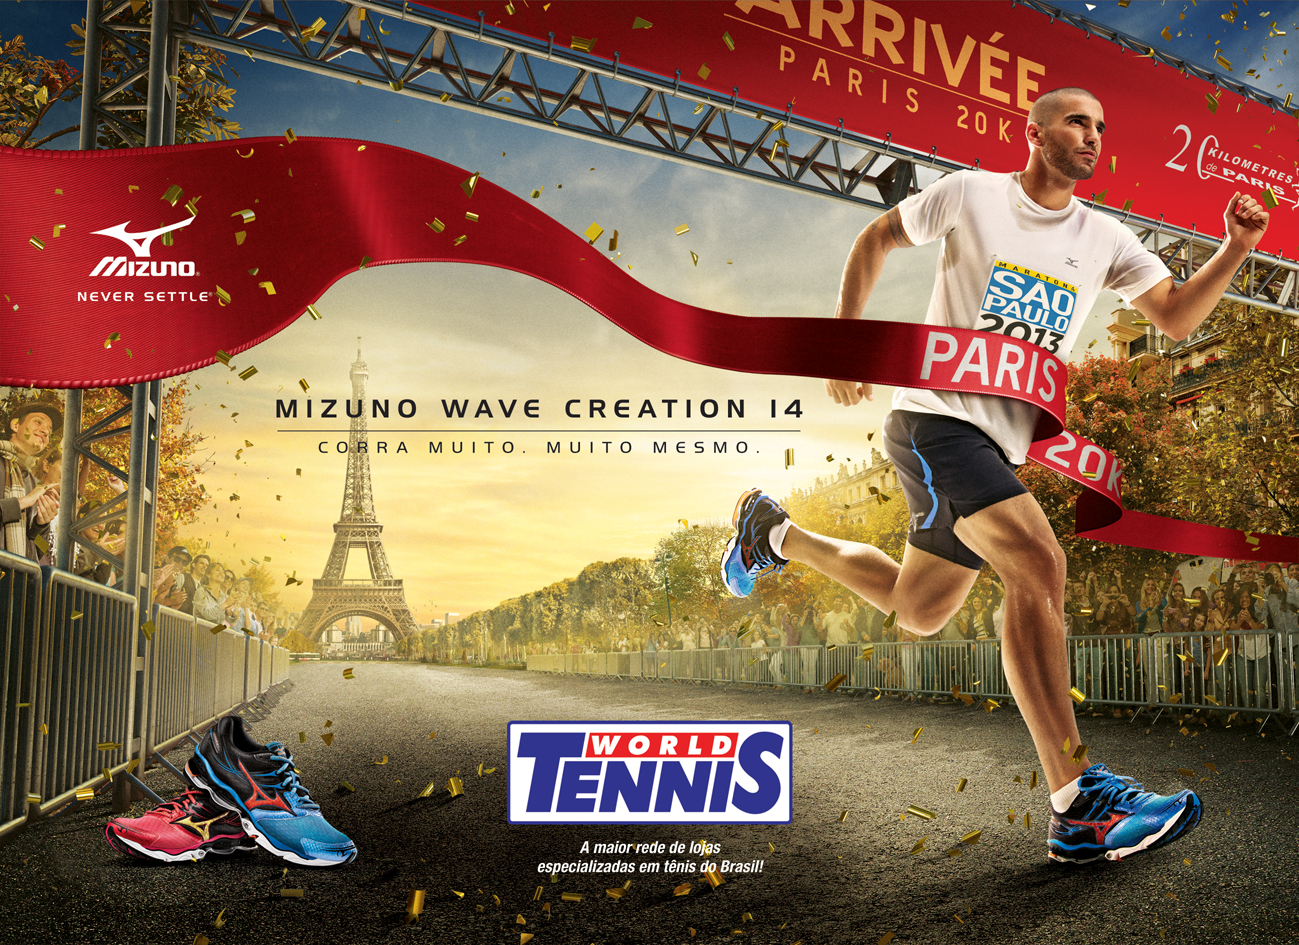 8f54e3fc699 World Tennis recebe campanha do Mizuno Wave Creation 14 - World ...